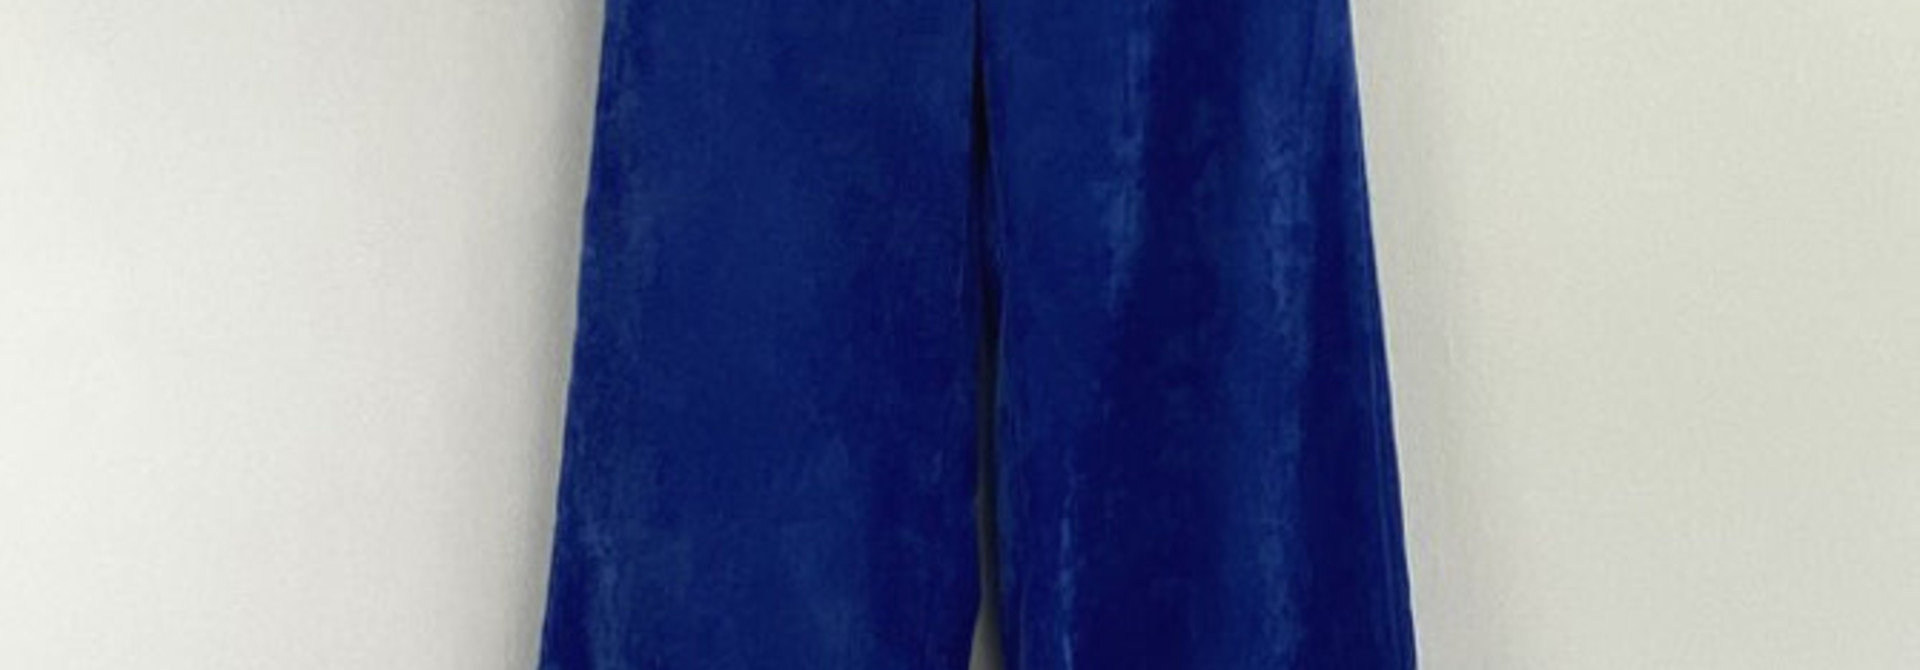 Charro corduroy wide pant Royal Cobalt